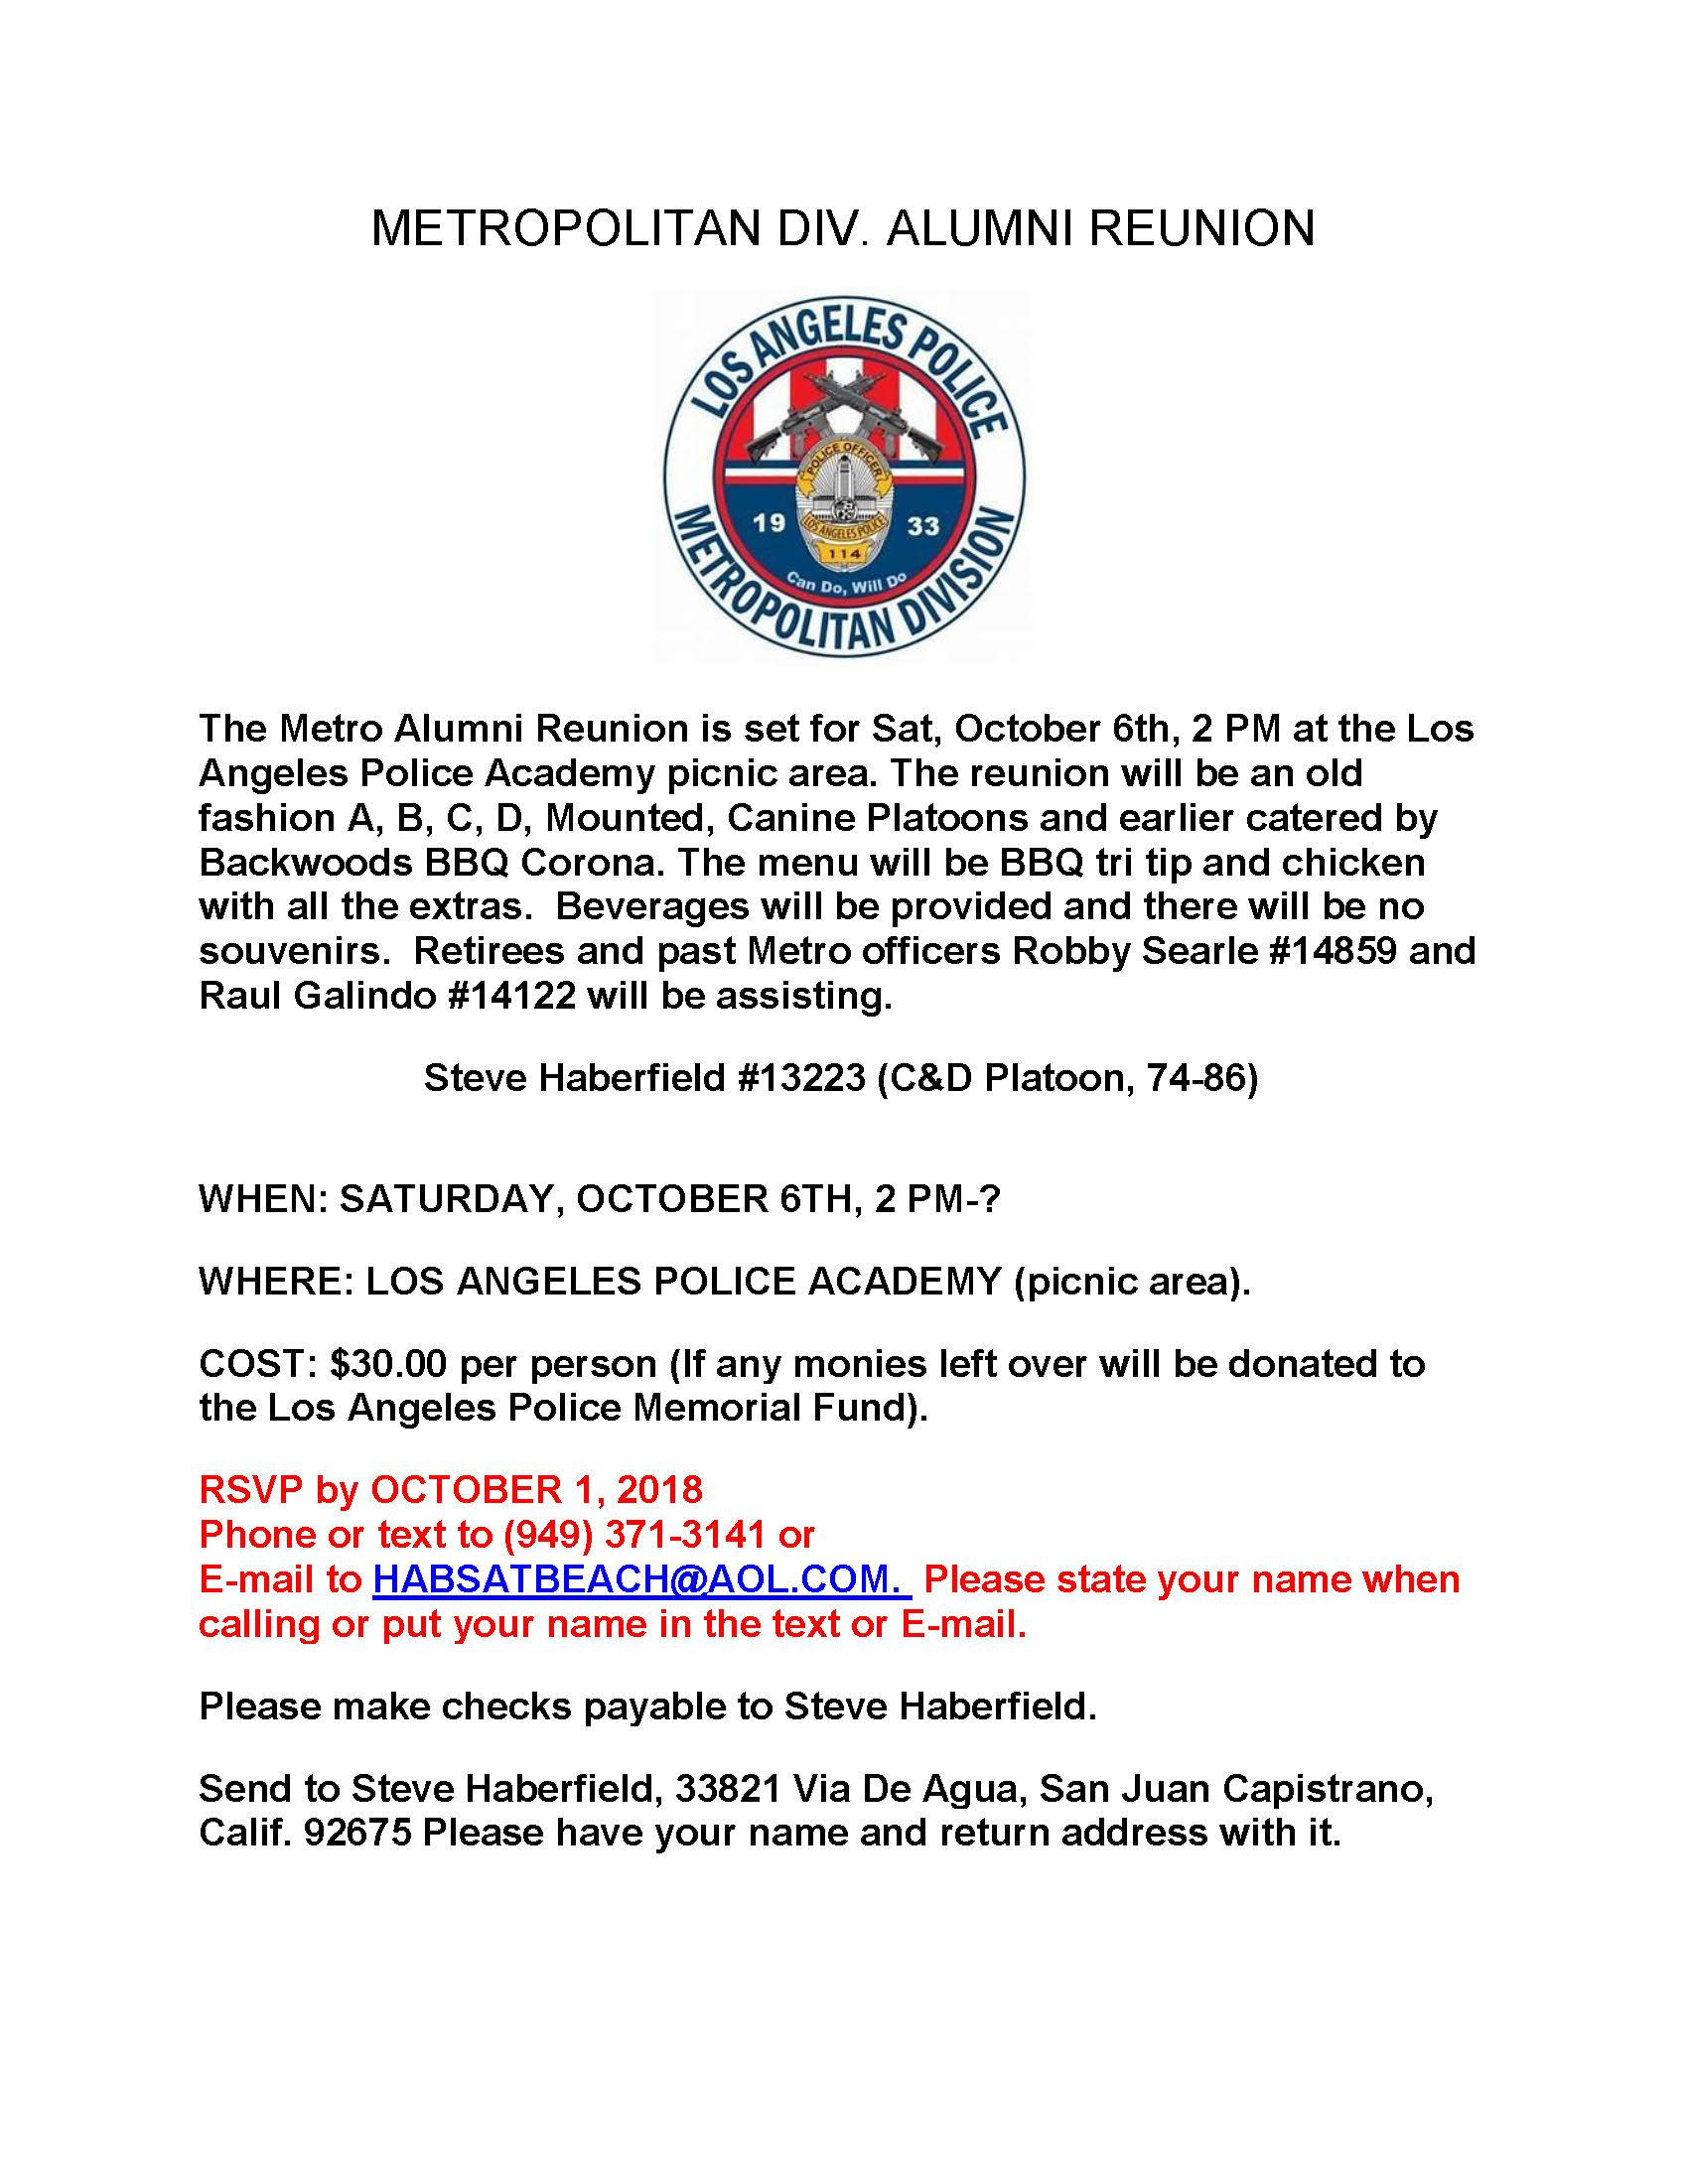 Metropolitan Division Alumni Reunion   LAPPL - Los Angeles Police